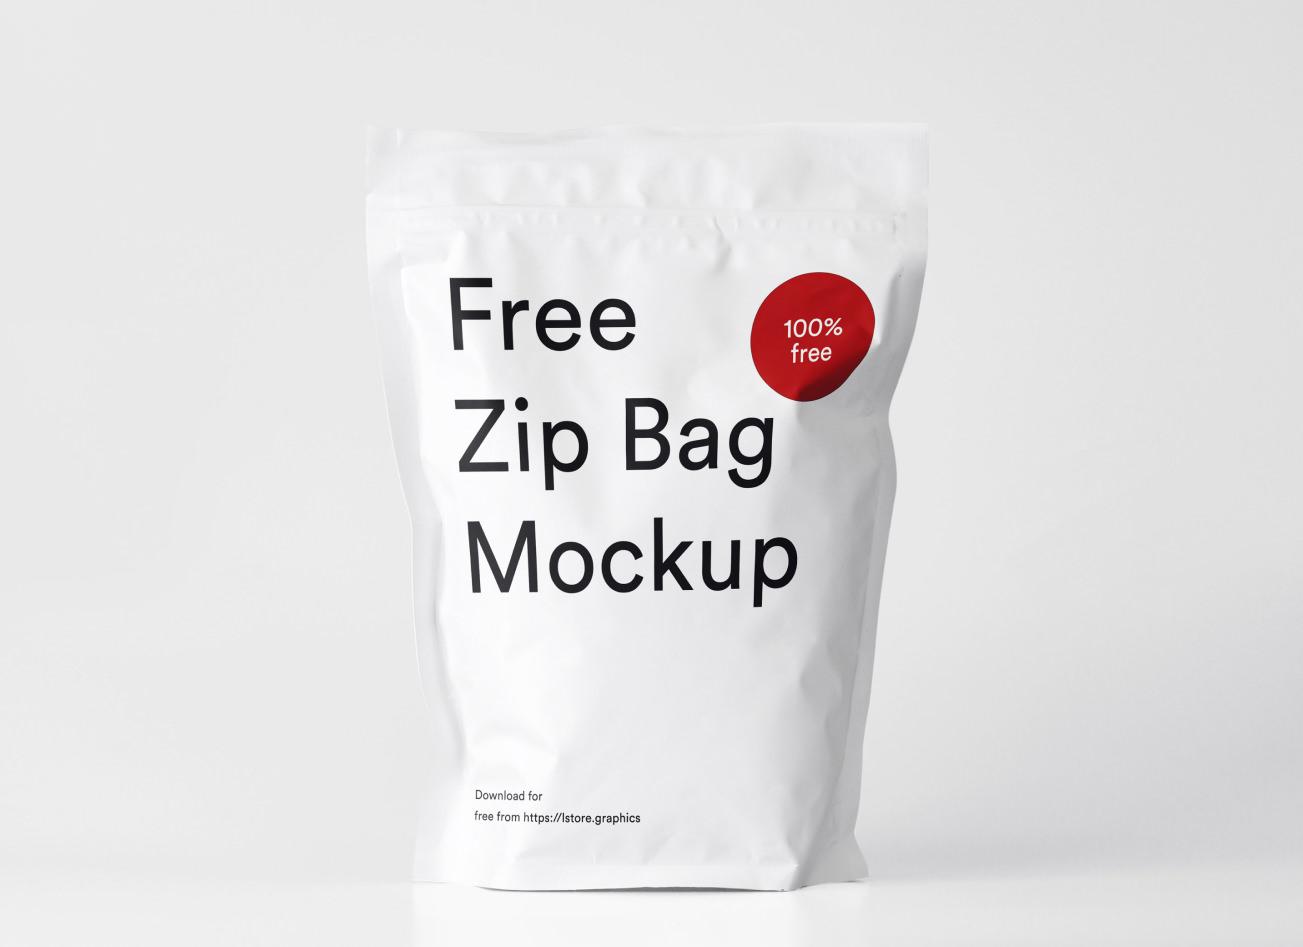 Packaging mockup free psd